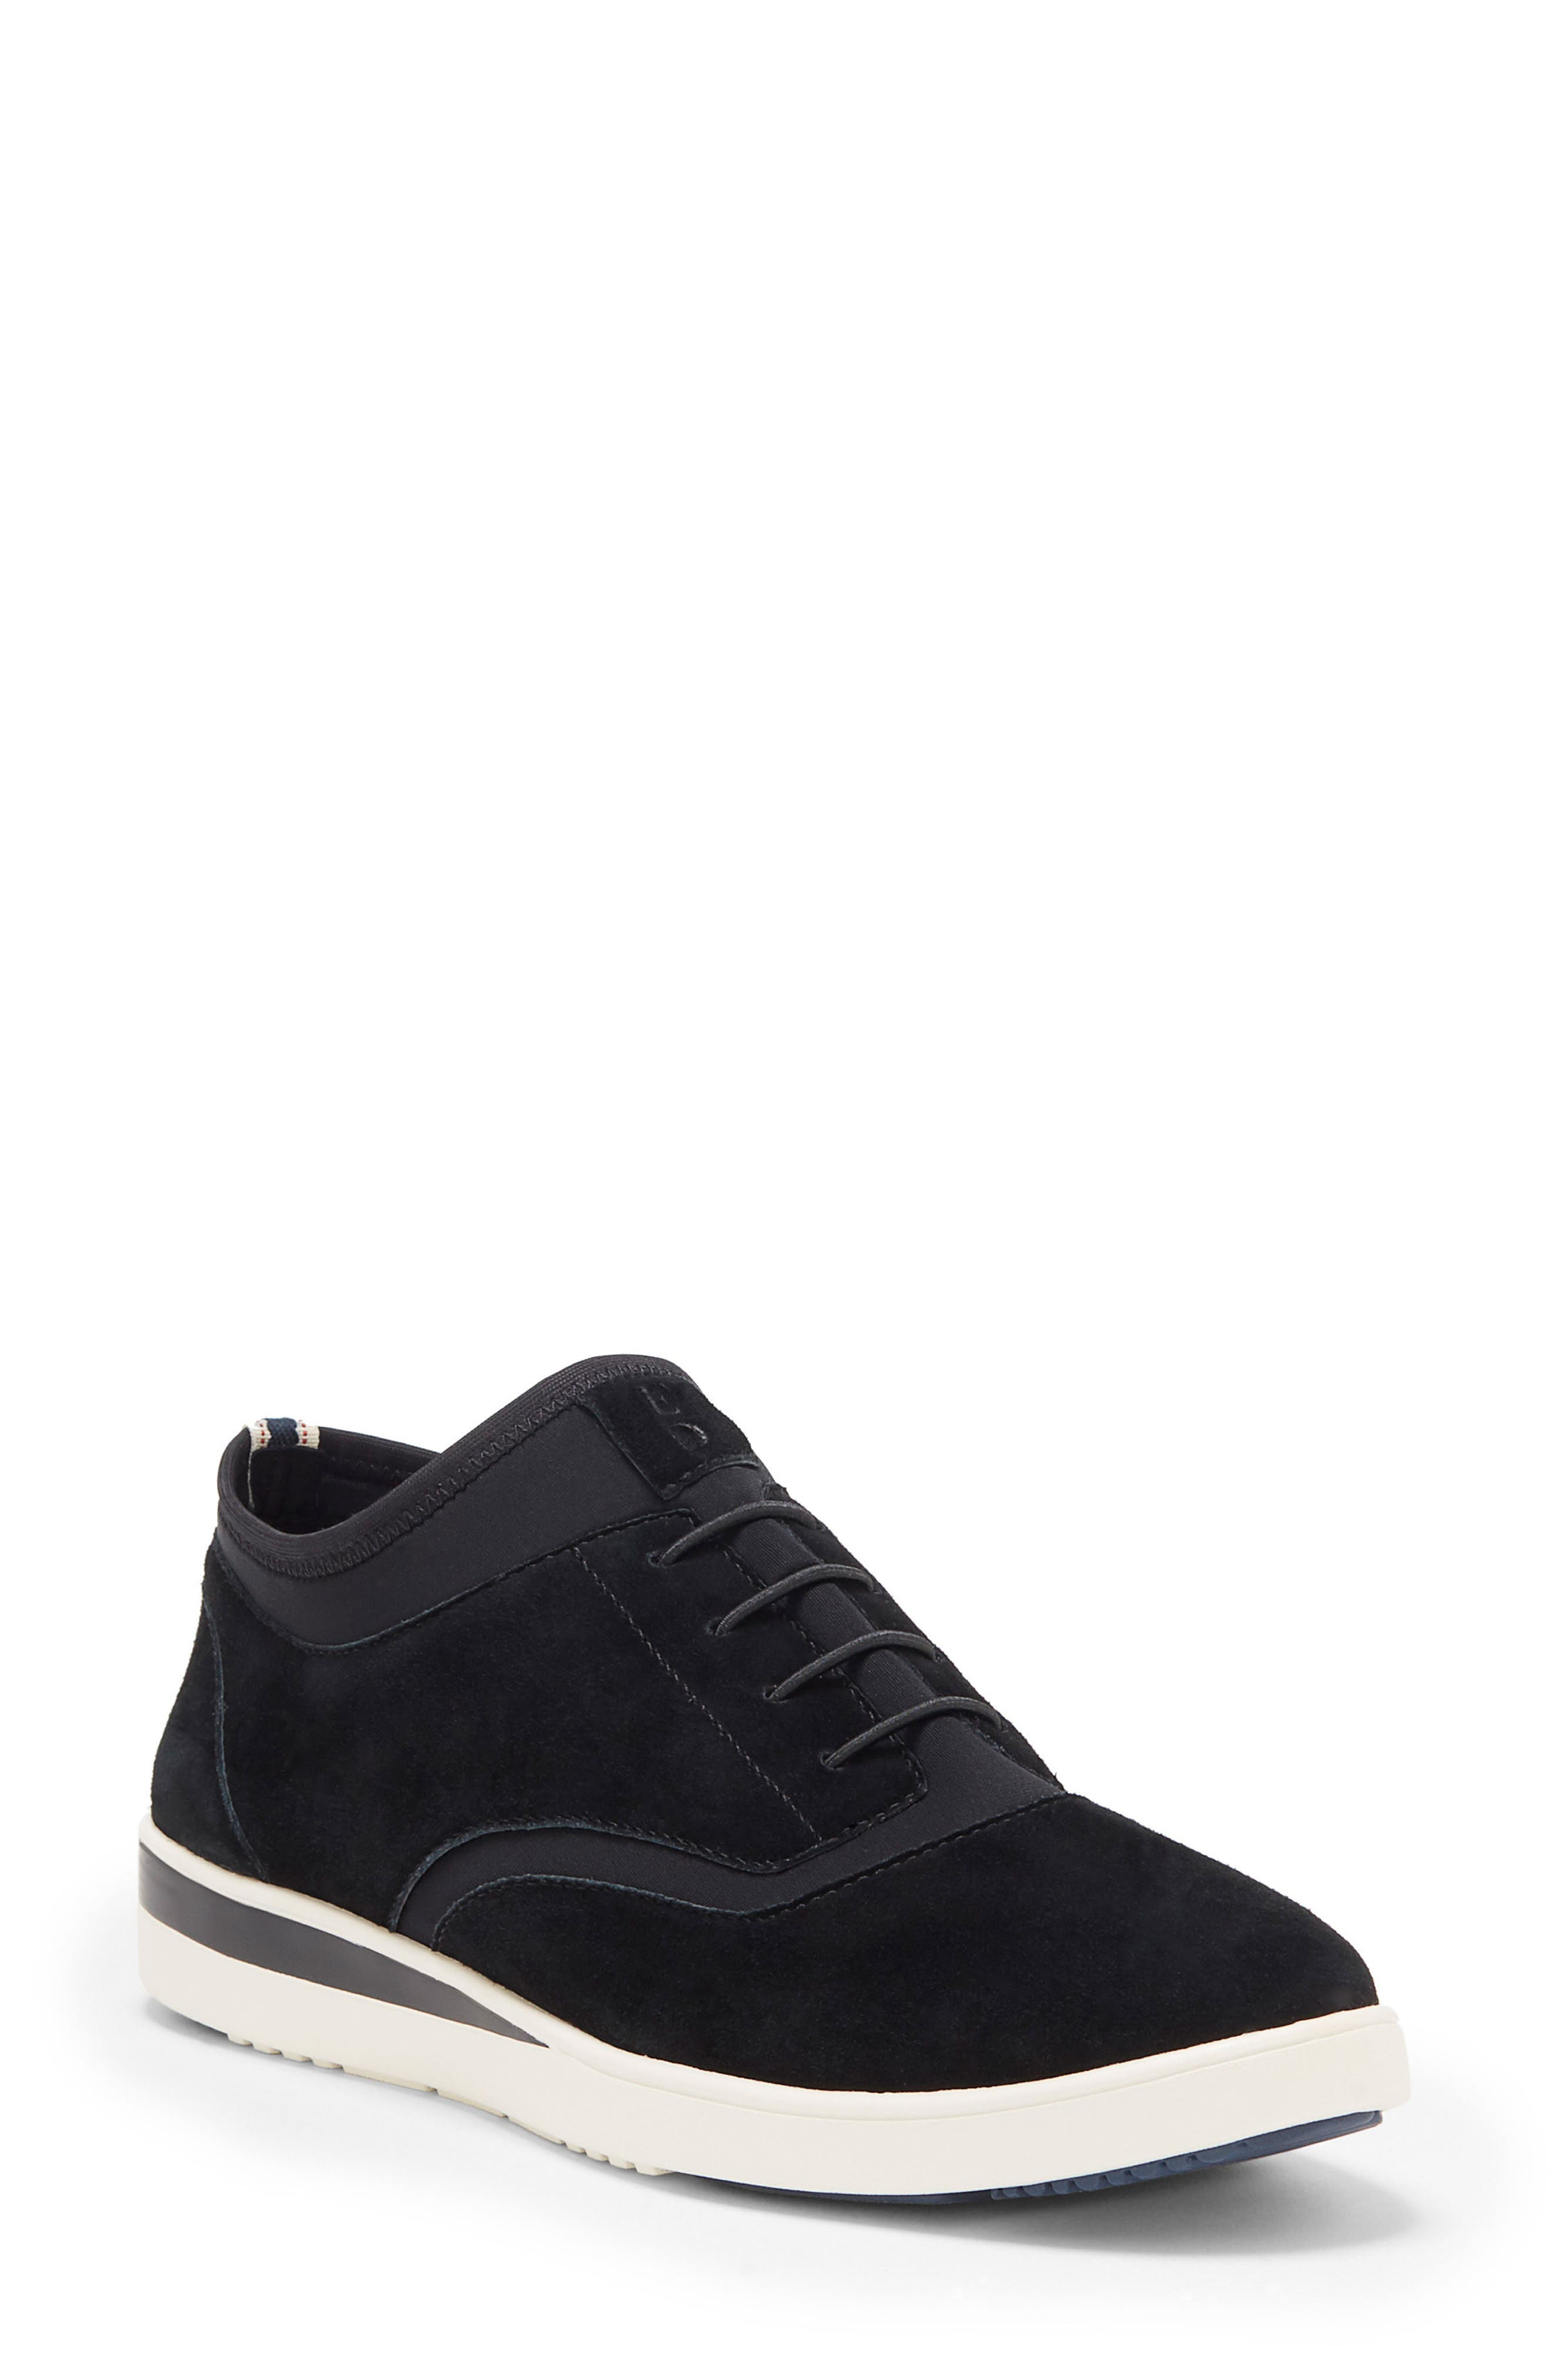 Atala Sneaker,                             Main thumbnail 1, color,                             002